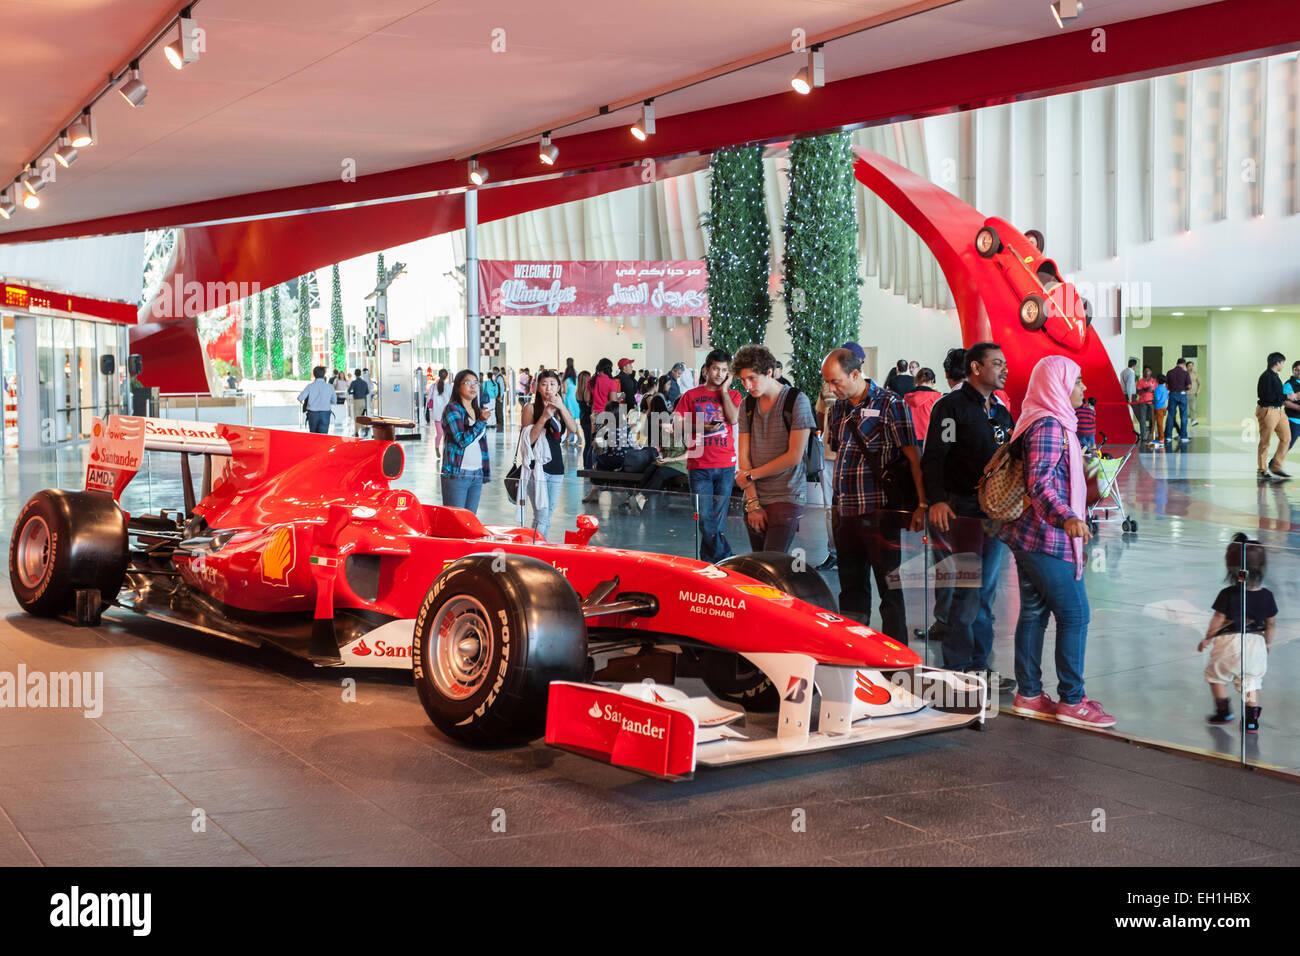 Formula One racing car at the Ferrari World Theme Park. December 19, 2014 in Abu Dhabi, United Arab Emirates - Stock Image